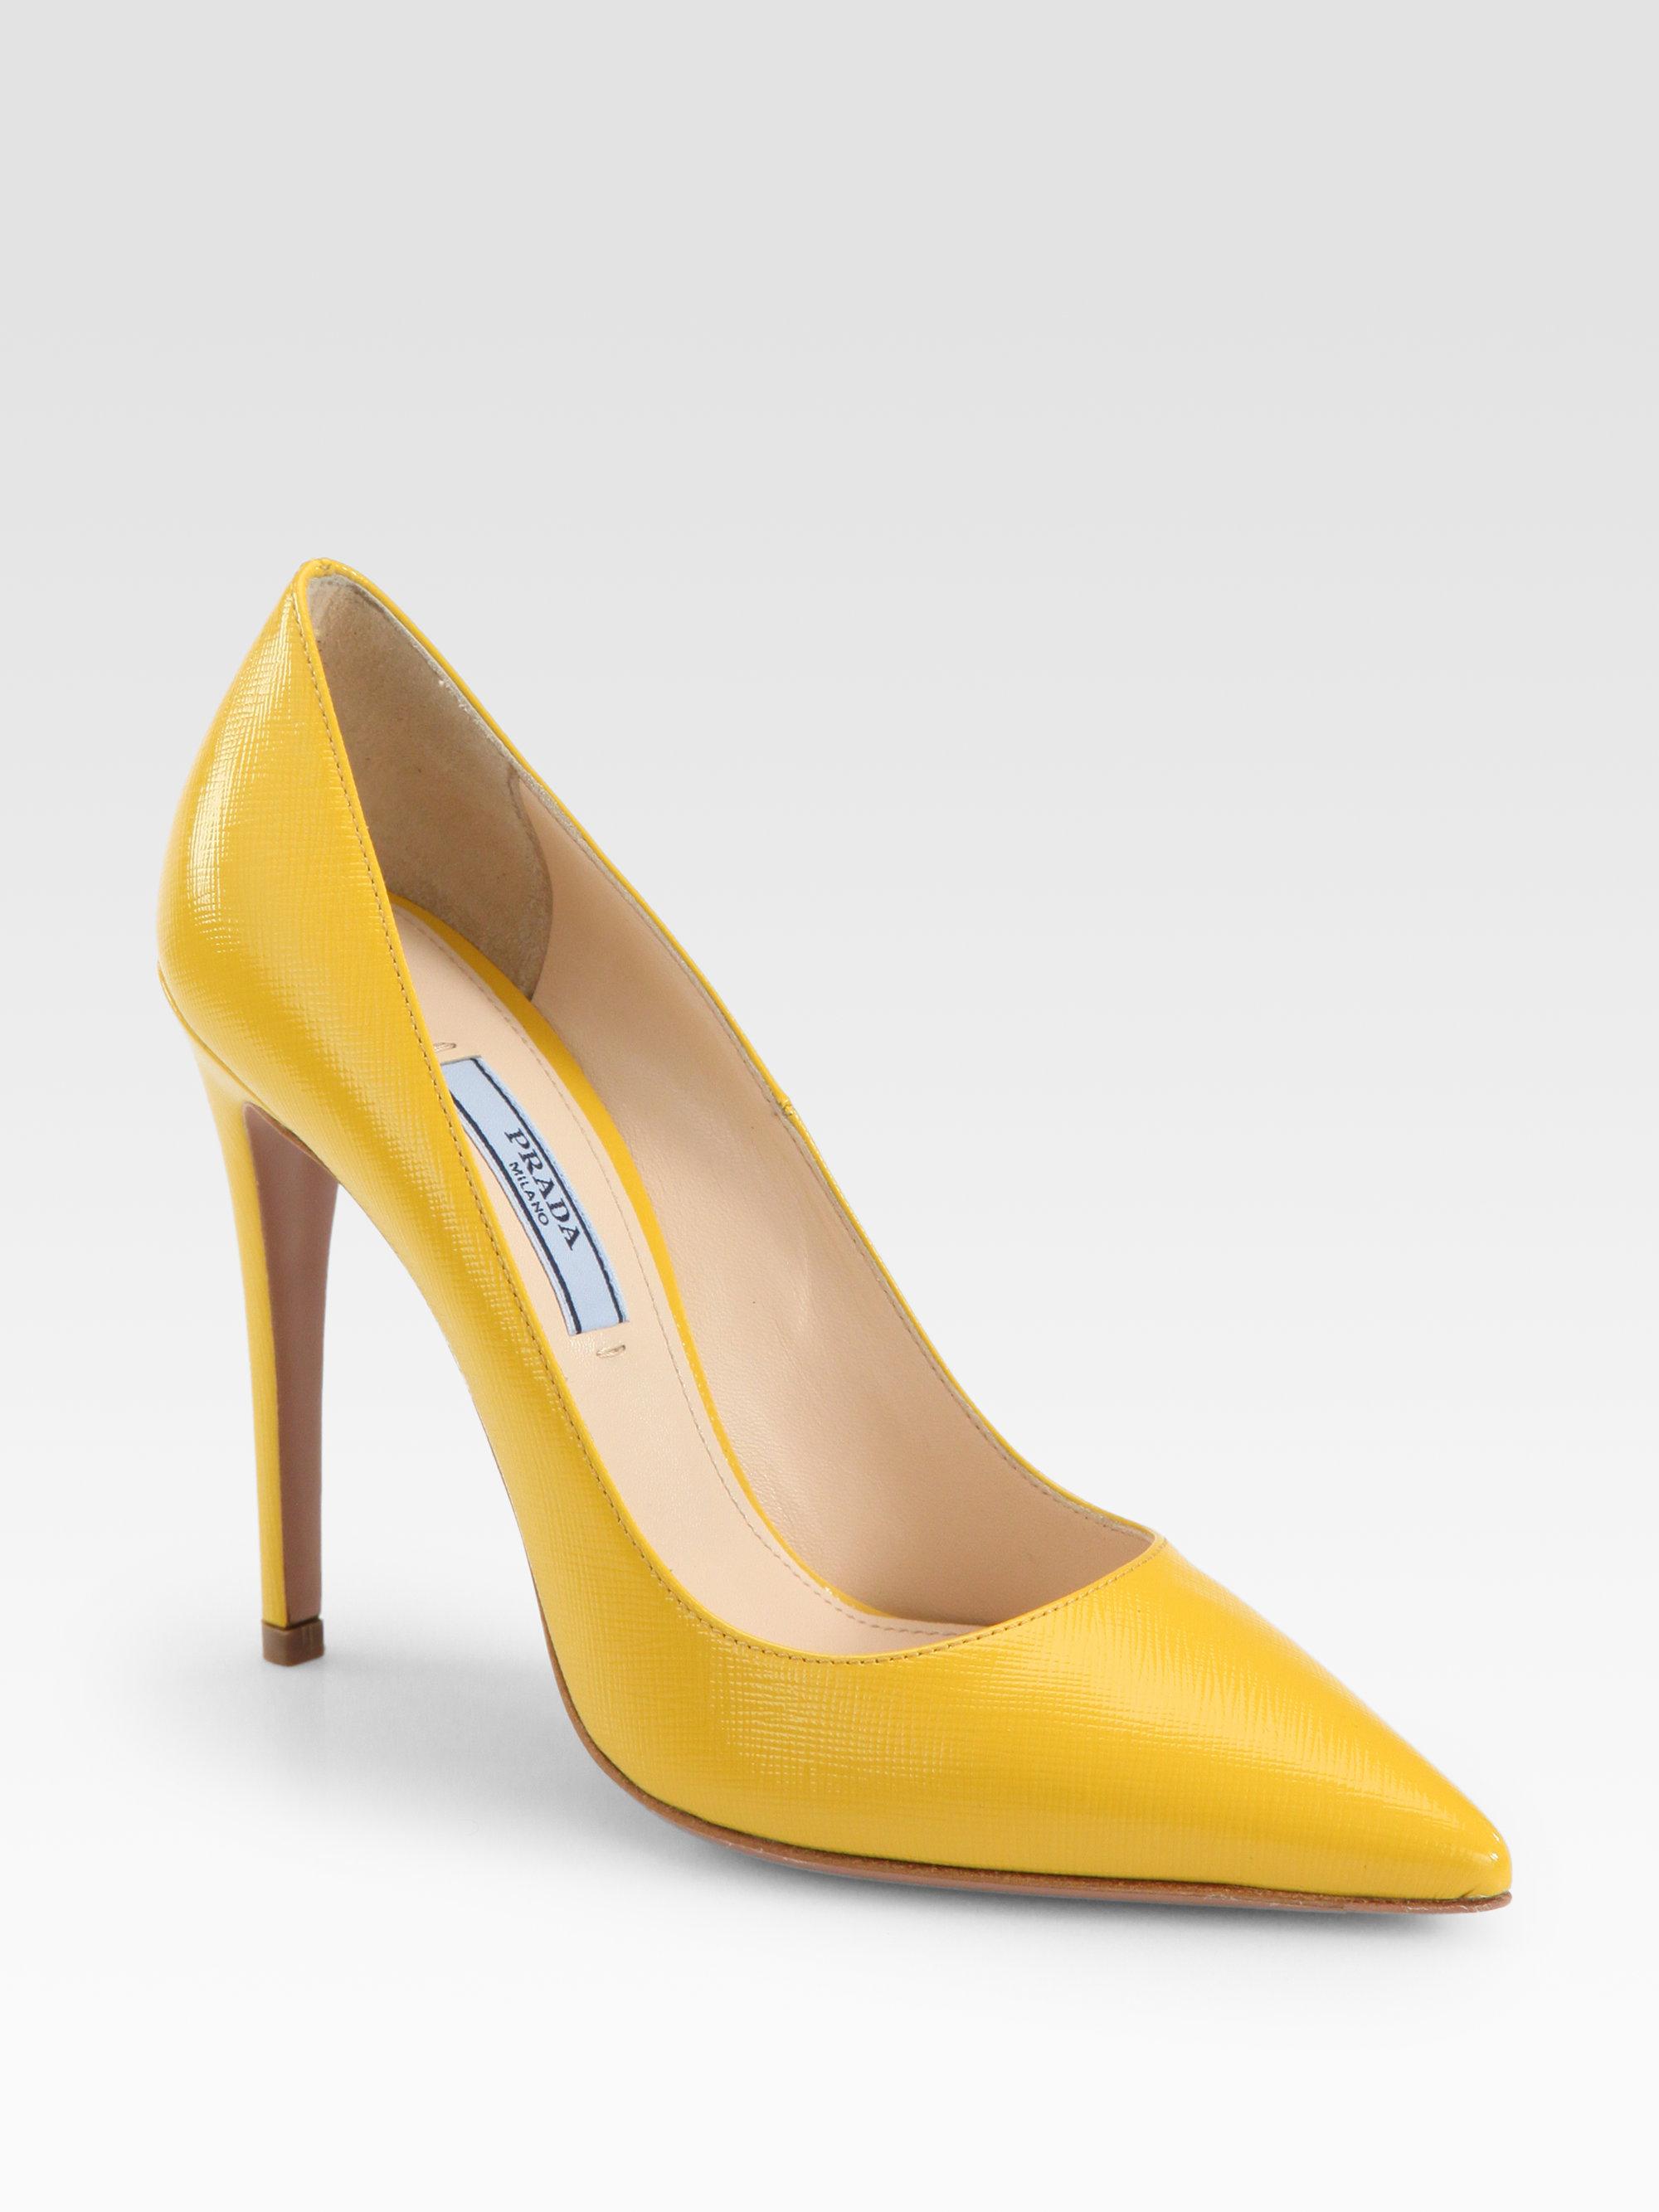 Lyst Prada Saffiano Leather Pumps In Yellow